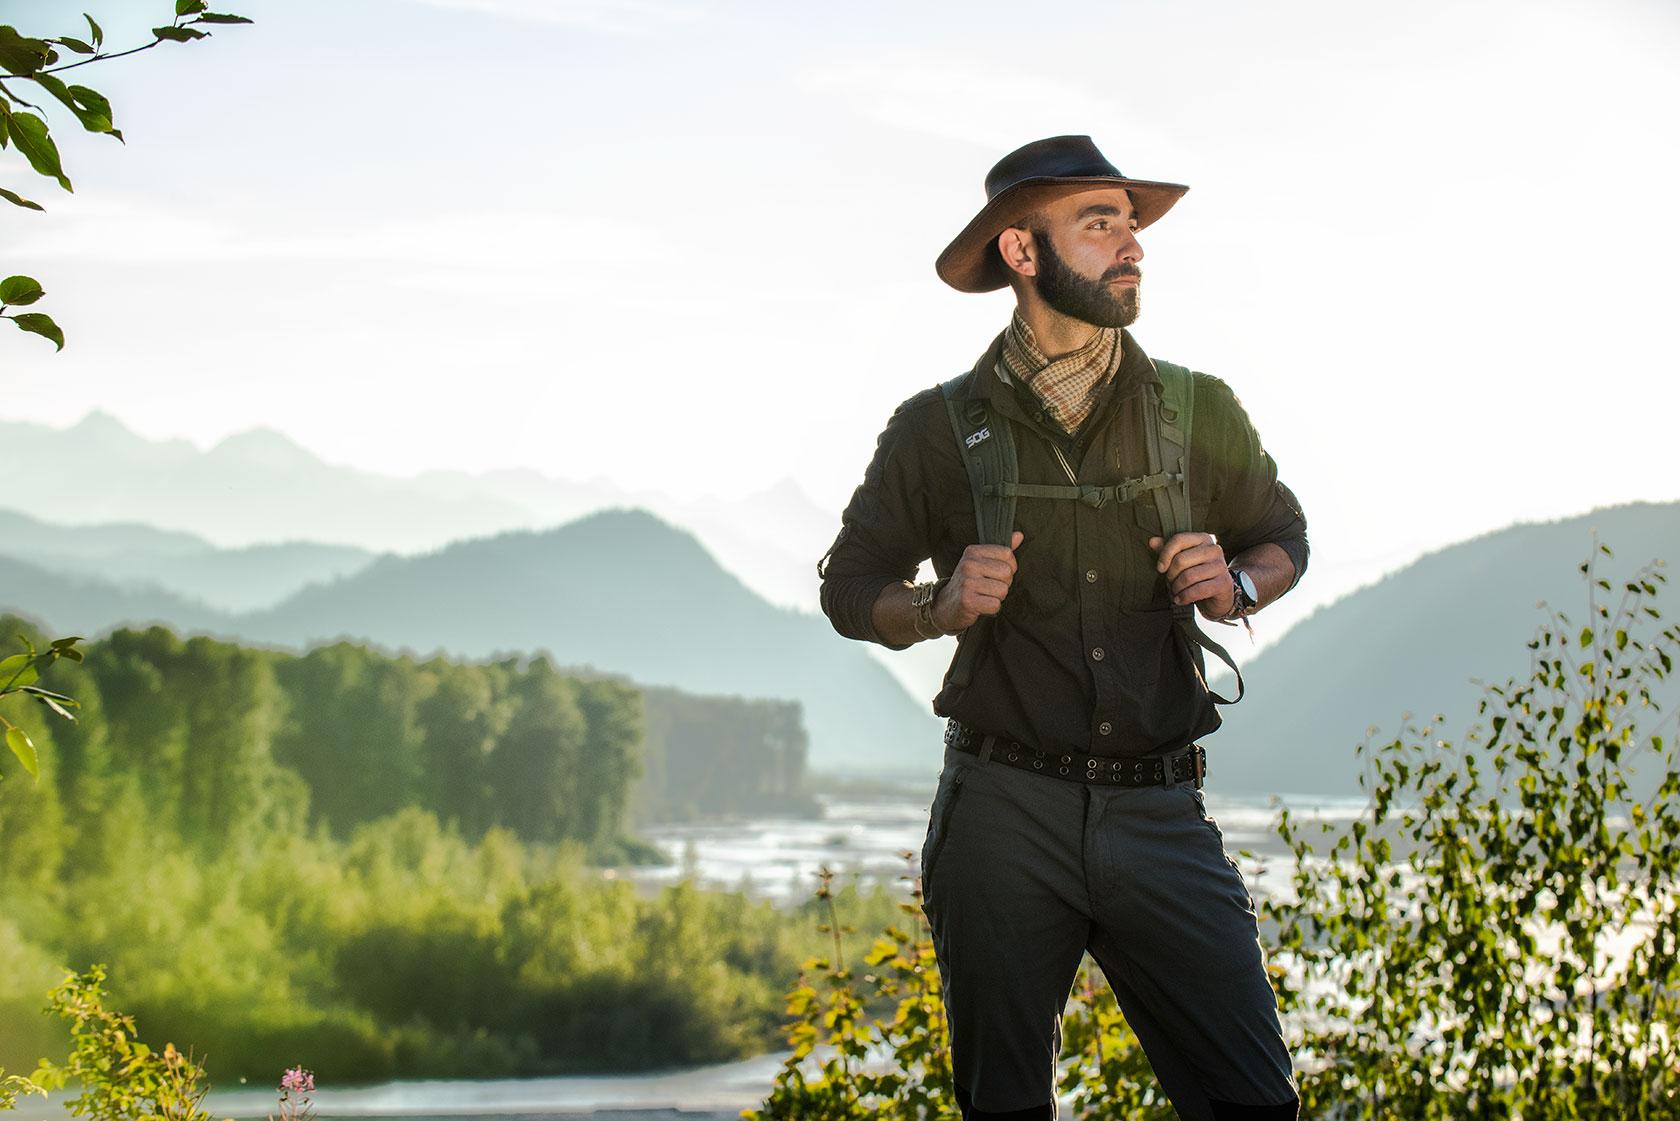 austin-trigg-brave-wilderness-alaska-BW-Coyote-Sunset-Above-River-pose.jpg